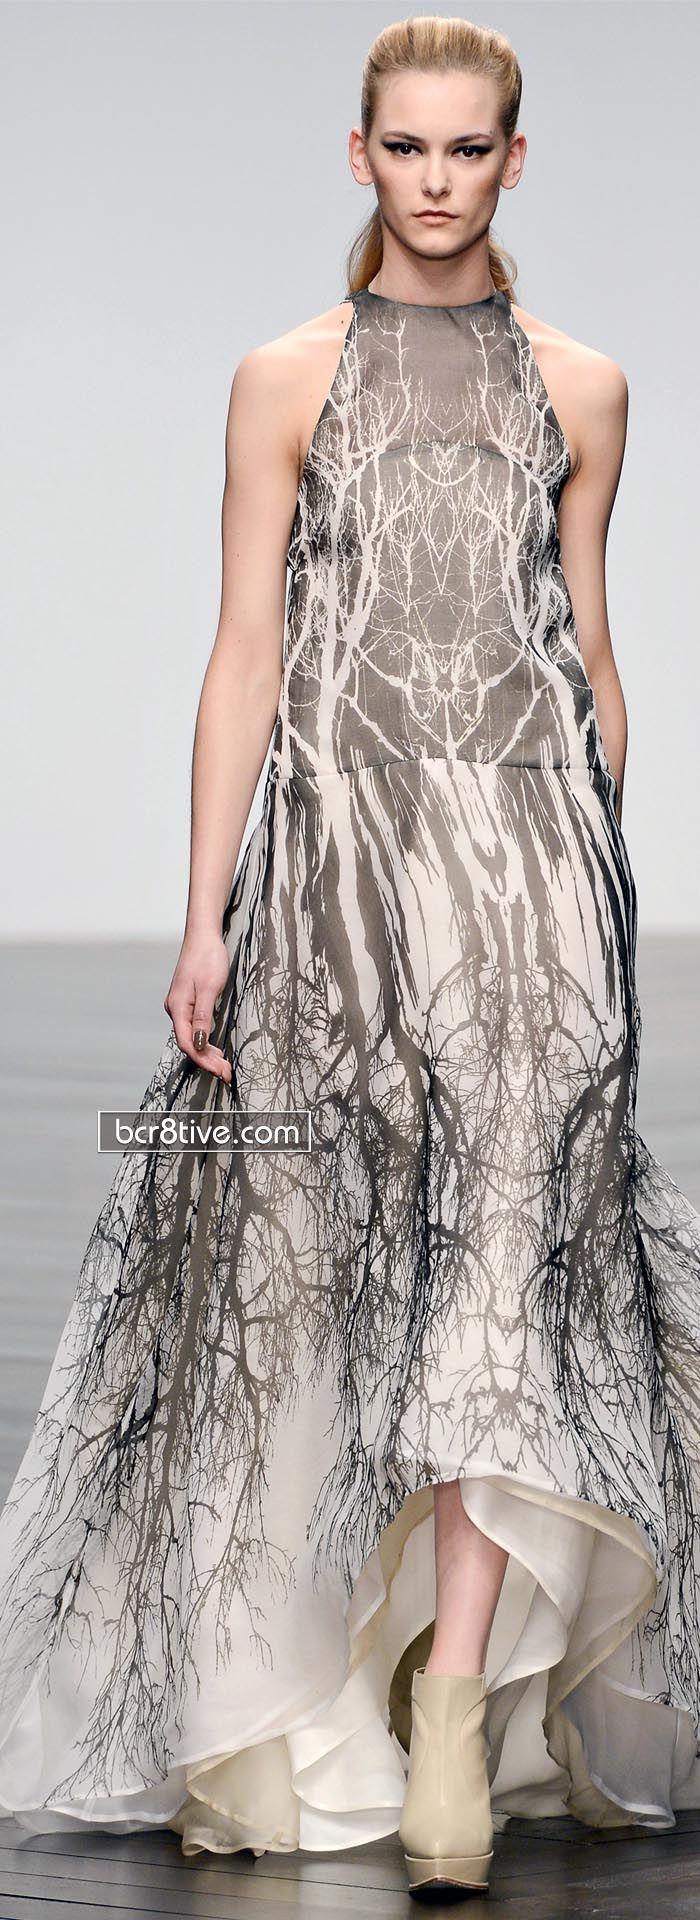 Robes - Robes Courtes Maria Grachvogel VZ8a7H